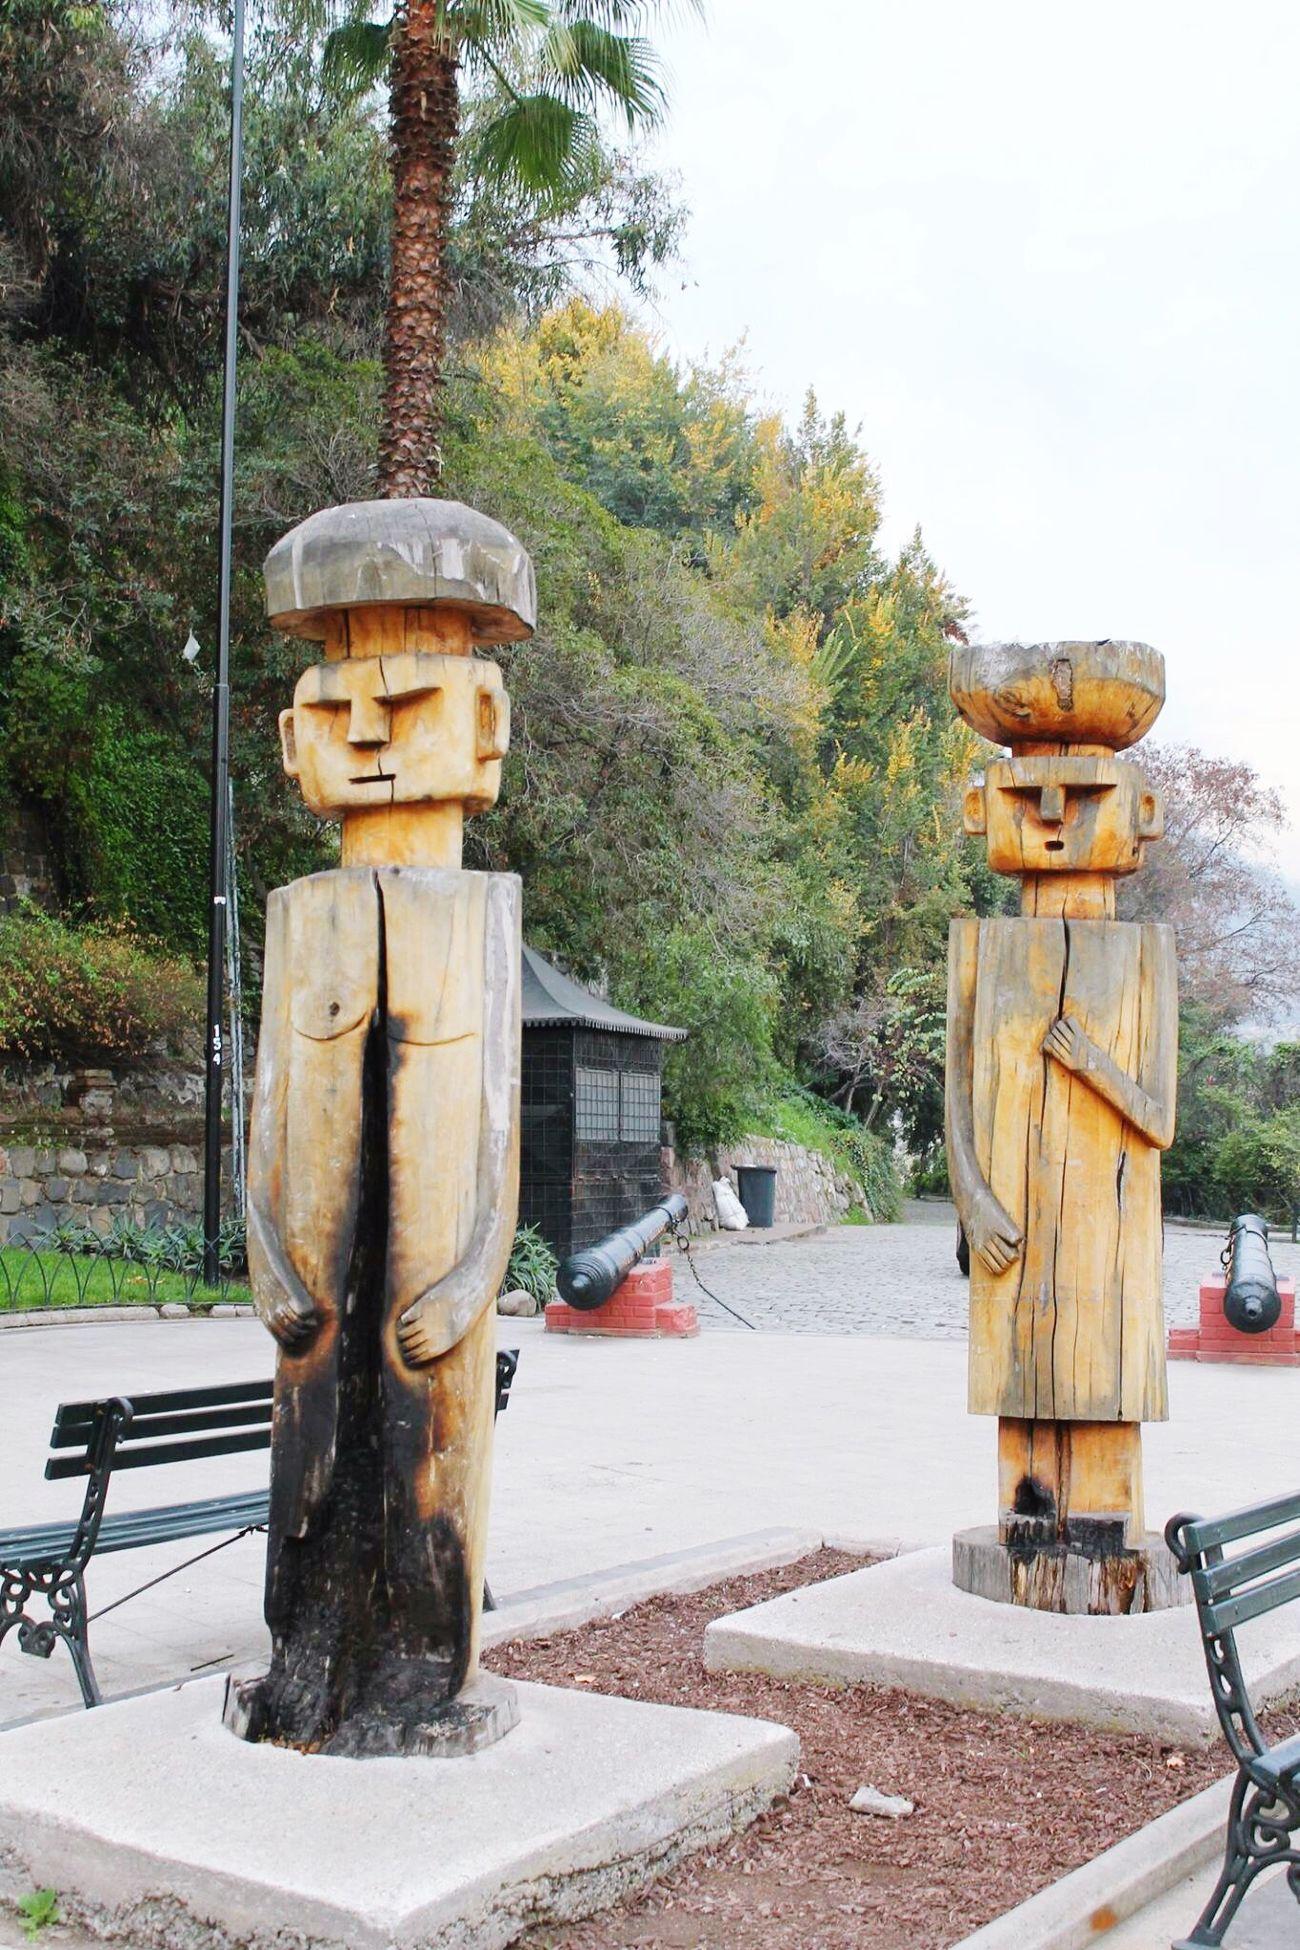 Sculpture Cerrosantalucia Cerro Santa Lucia Arte Tronco Escultura Atardecer